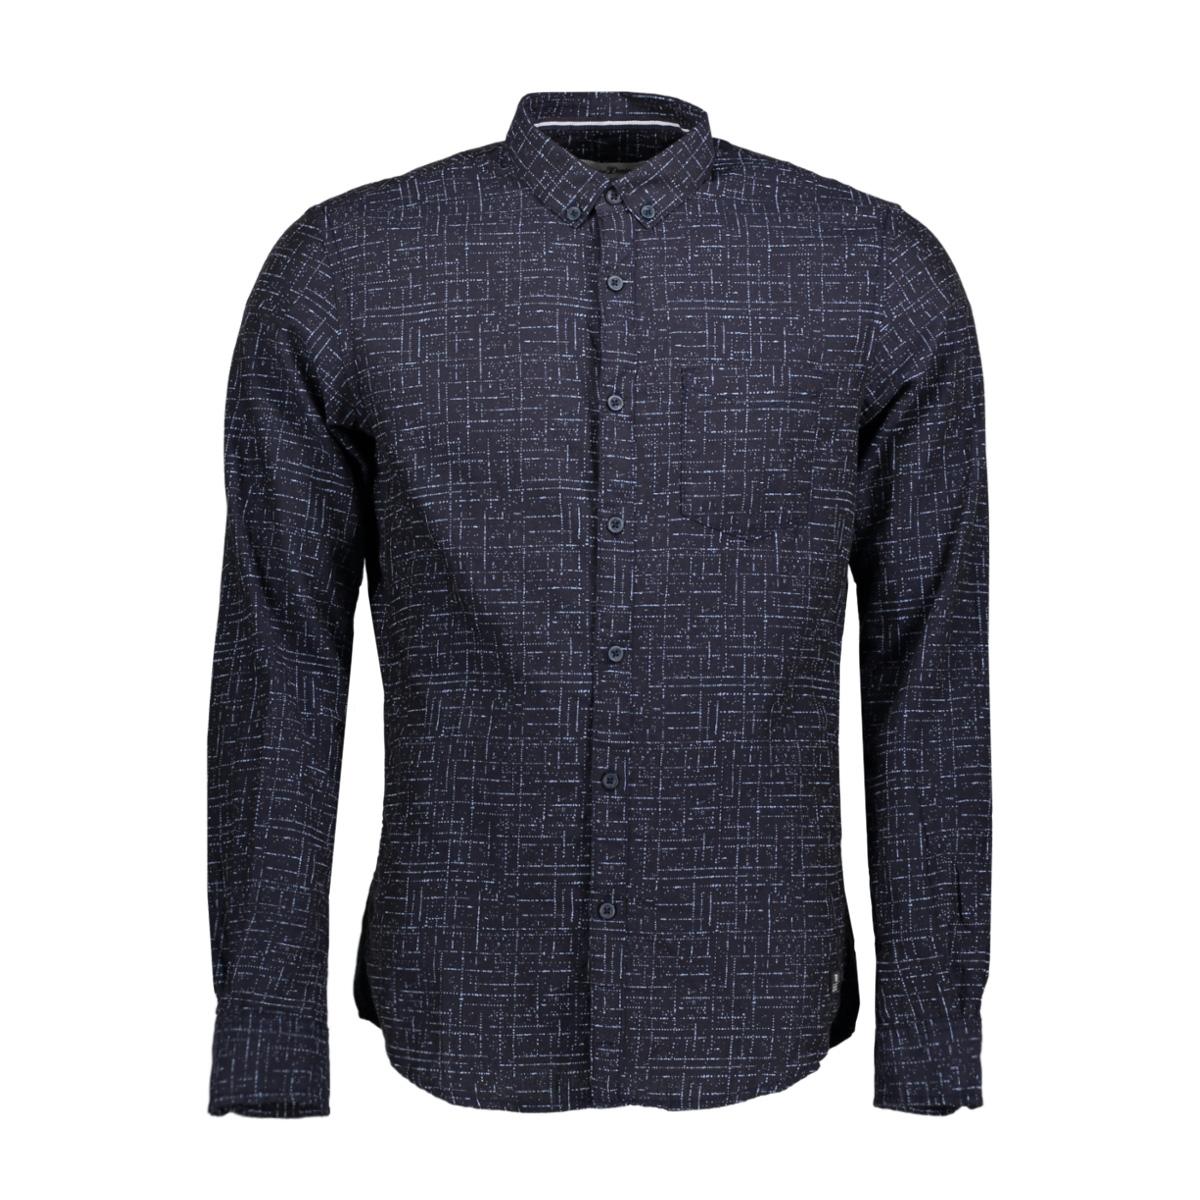 2055101.00.12 tom tailor overhemd 6740